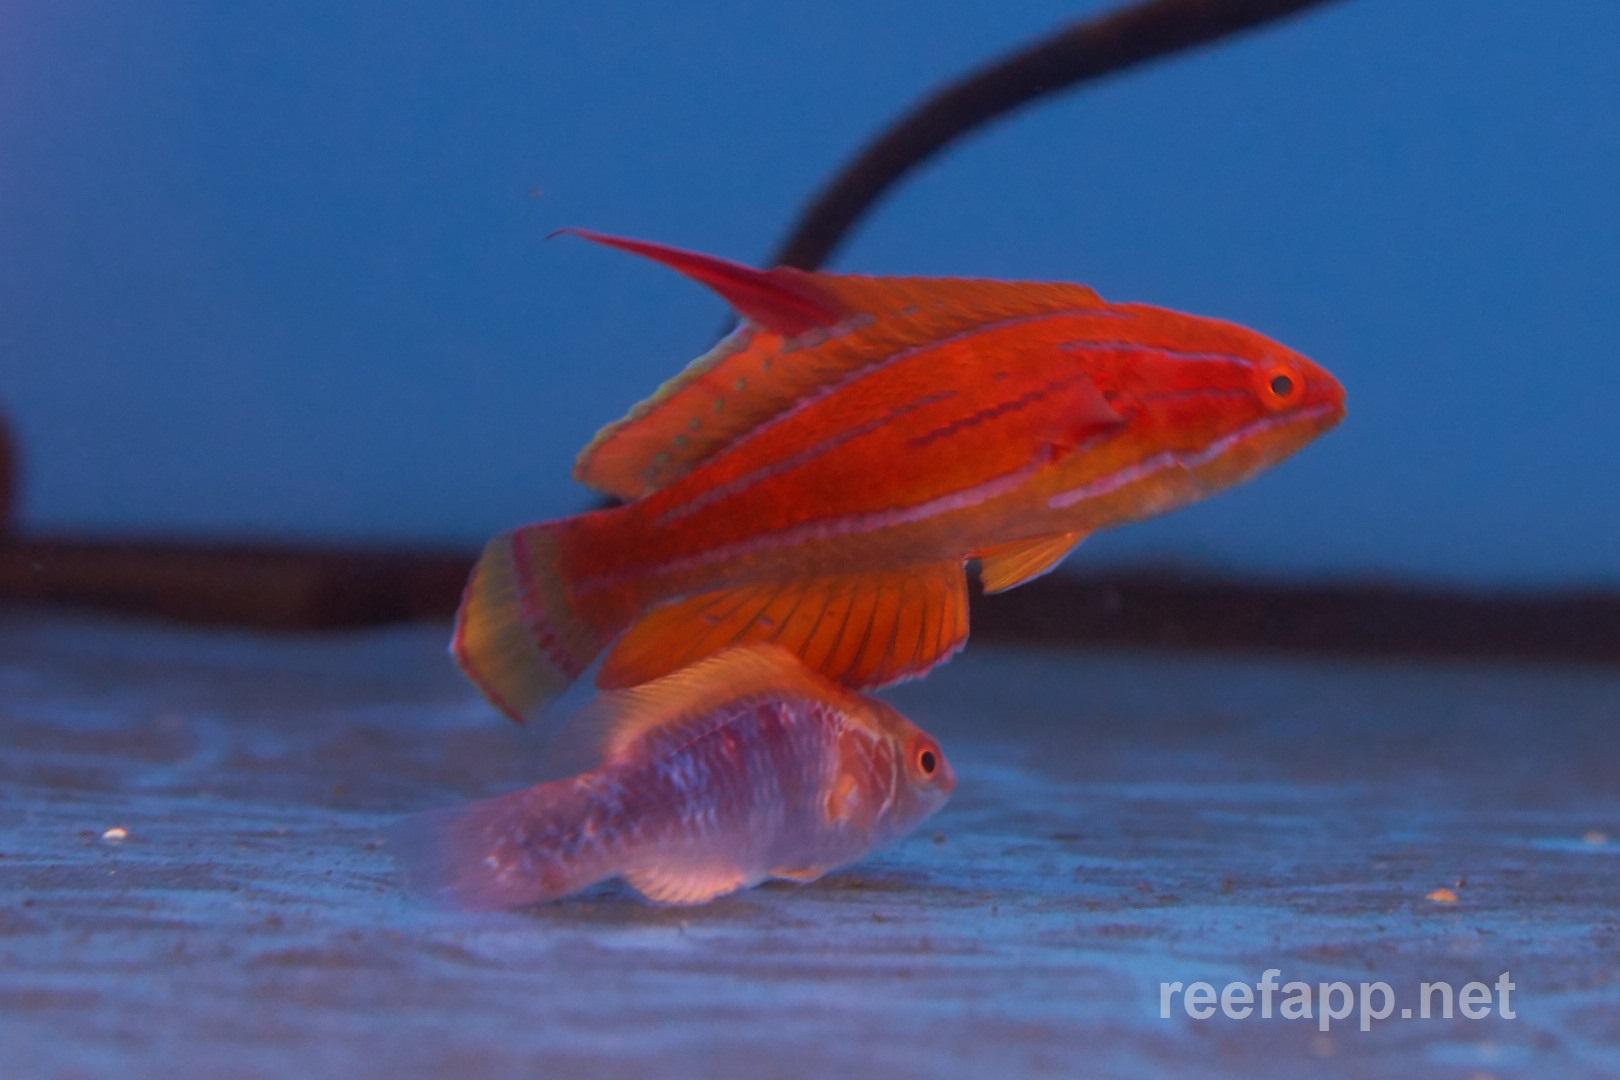 Yellowfin flasher wrasse (Paracheilinus flavianalis) in aquarium